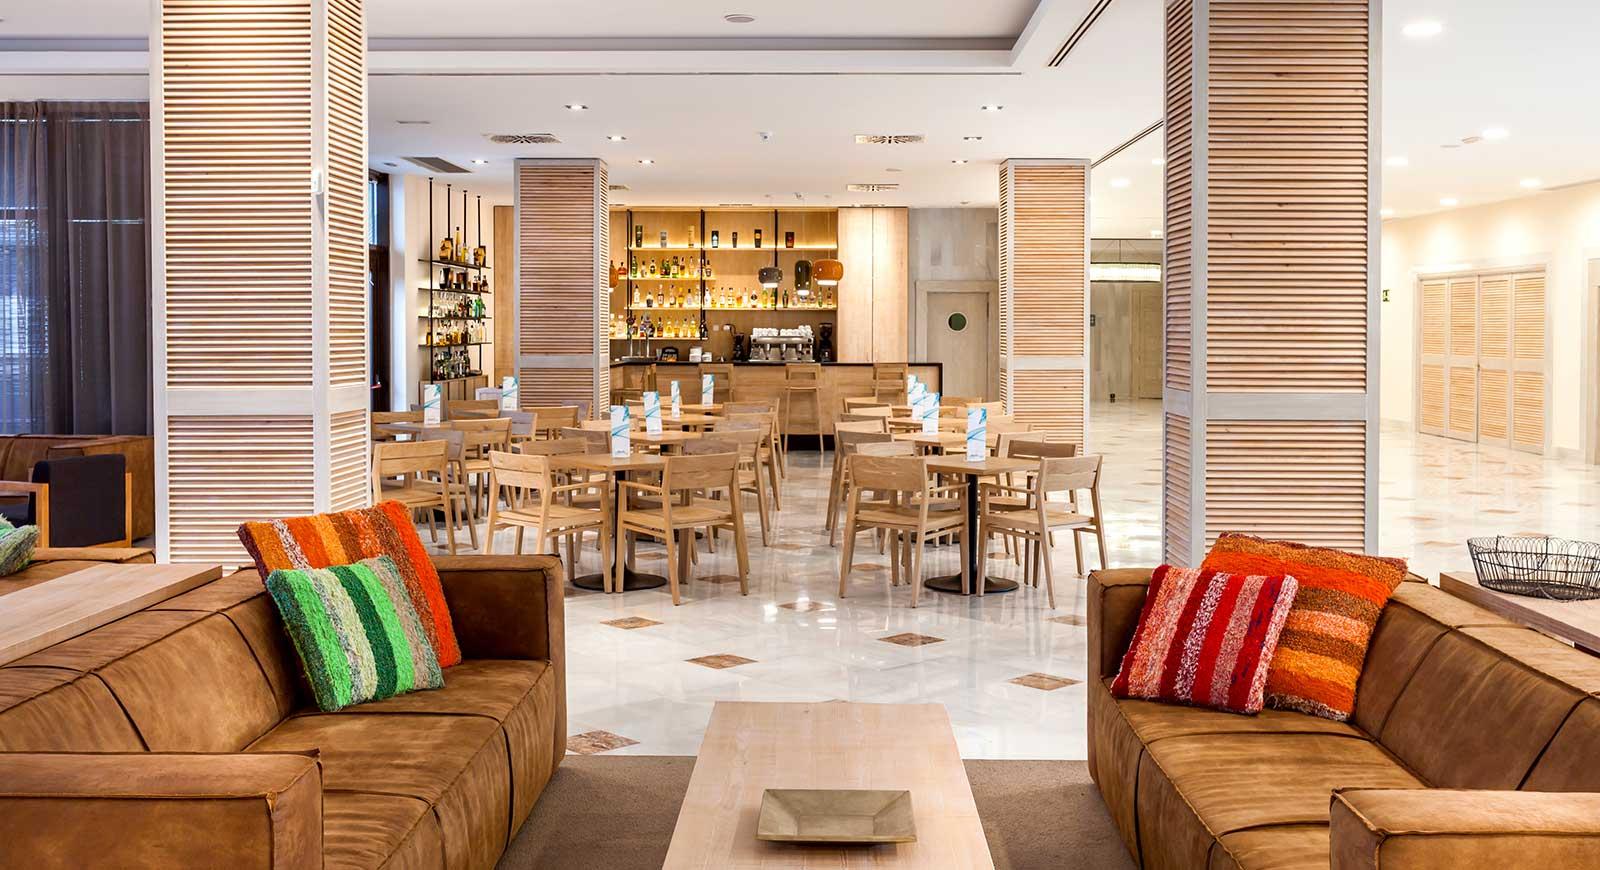 236-facilities-8-hotel-barcelo-cabo-de-gata_tcm20-8435_w1600_h870_n.jpg